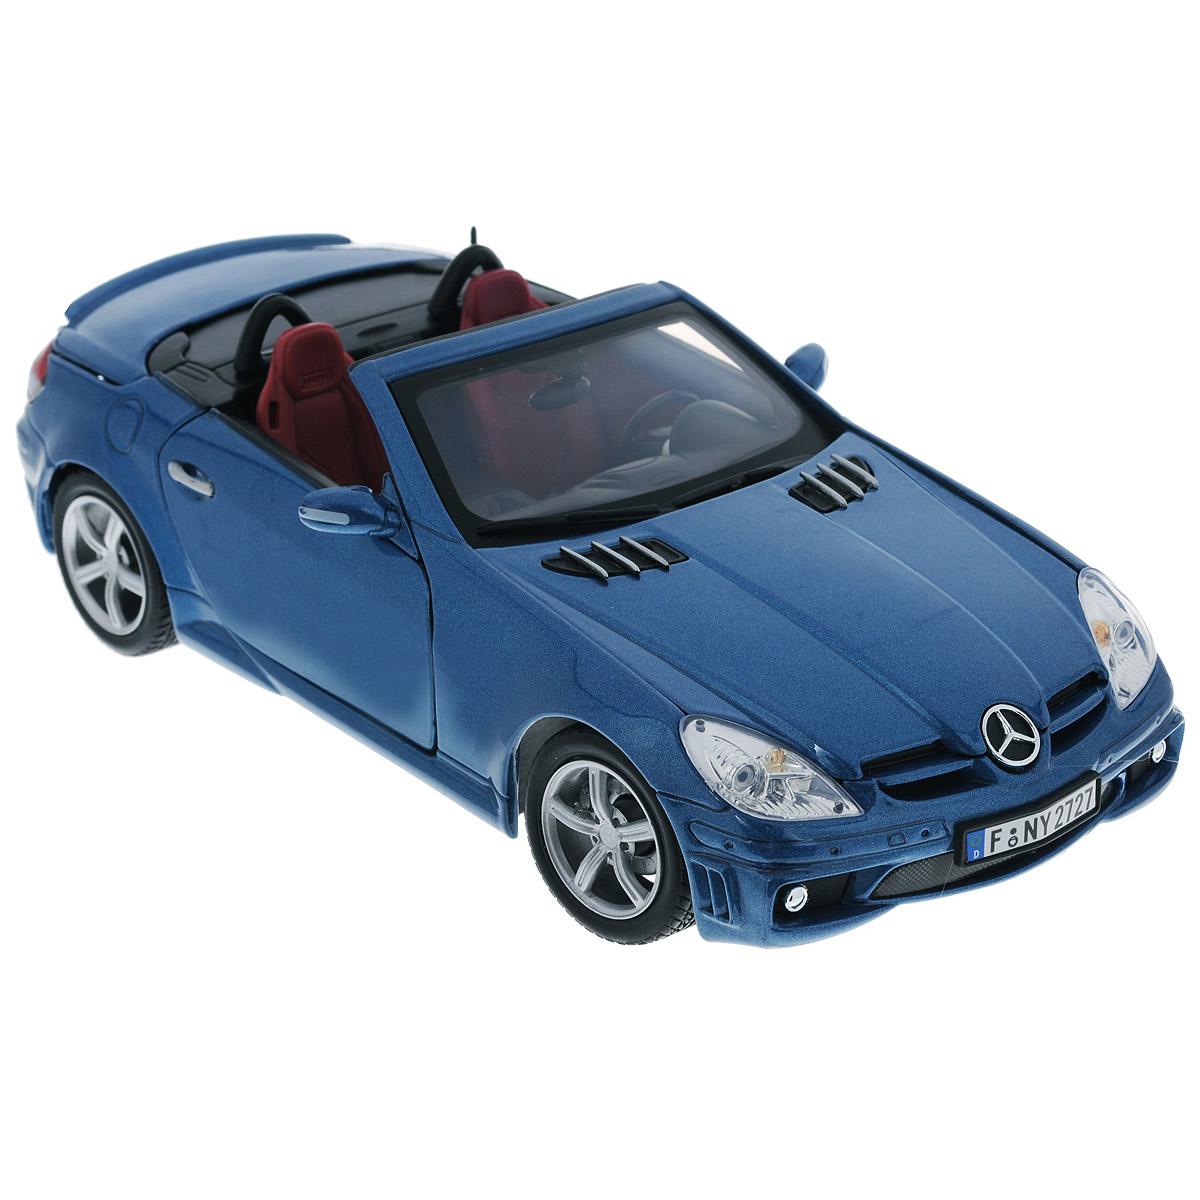 Autotime Коллекционная модель Mercedes Benz SLK55 АMG, цвет: синий металлик. Масштаб 1/18 autotime коллекционная модель автомобиля saleen s7 цвет оранжевый масштаб 1 18